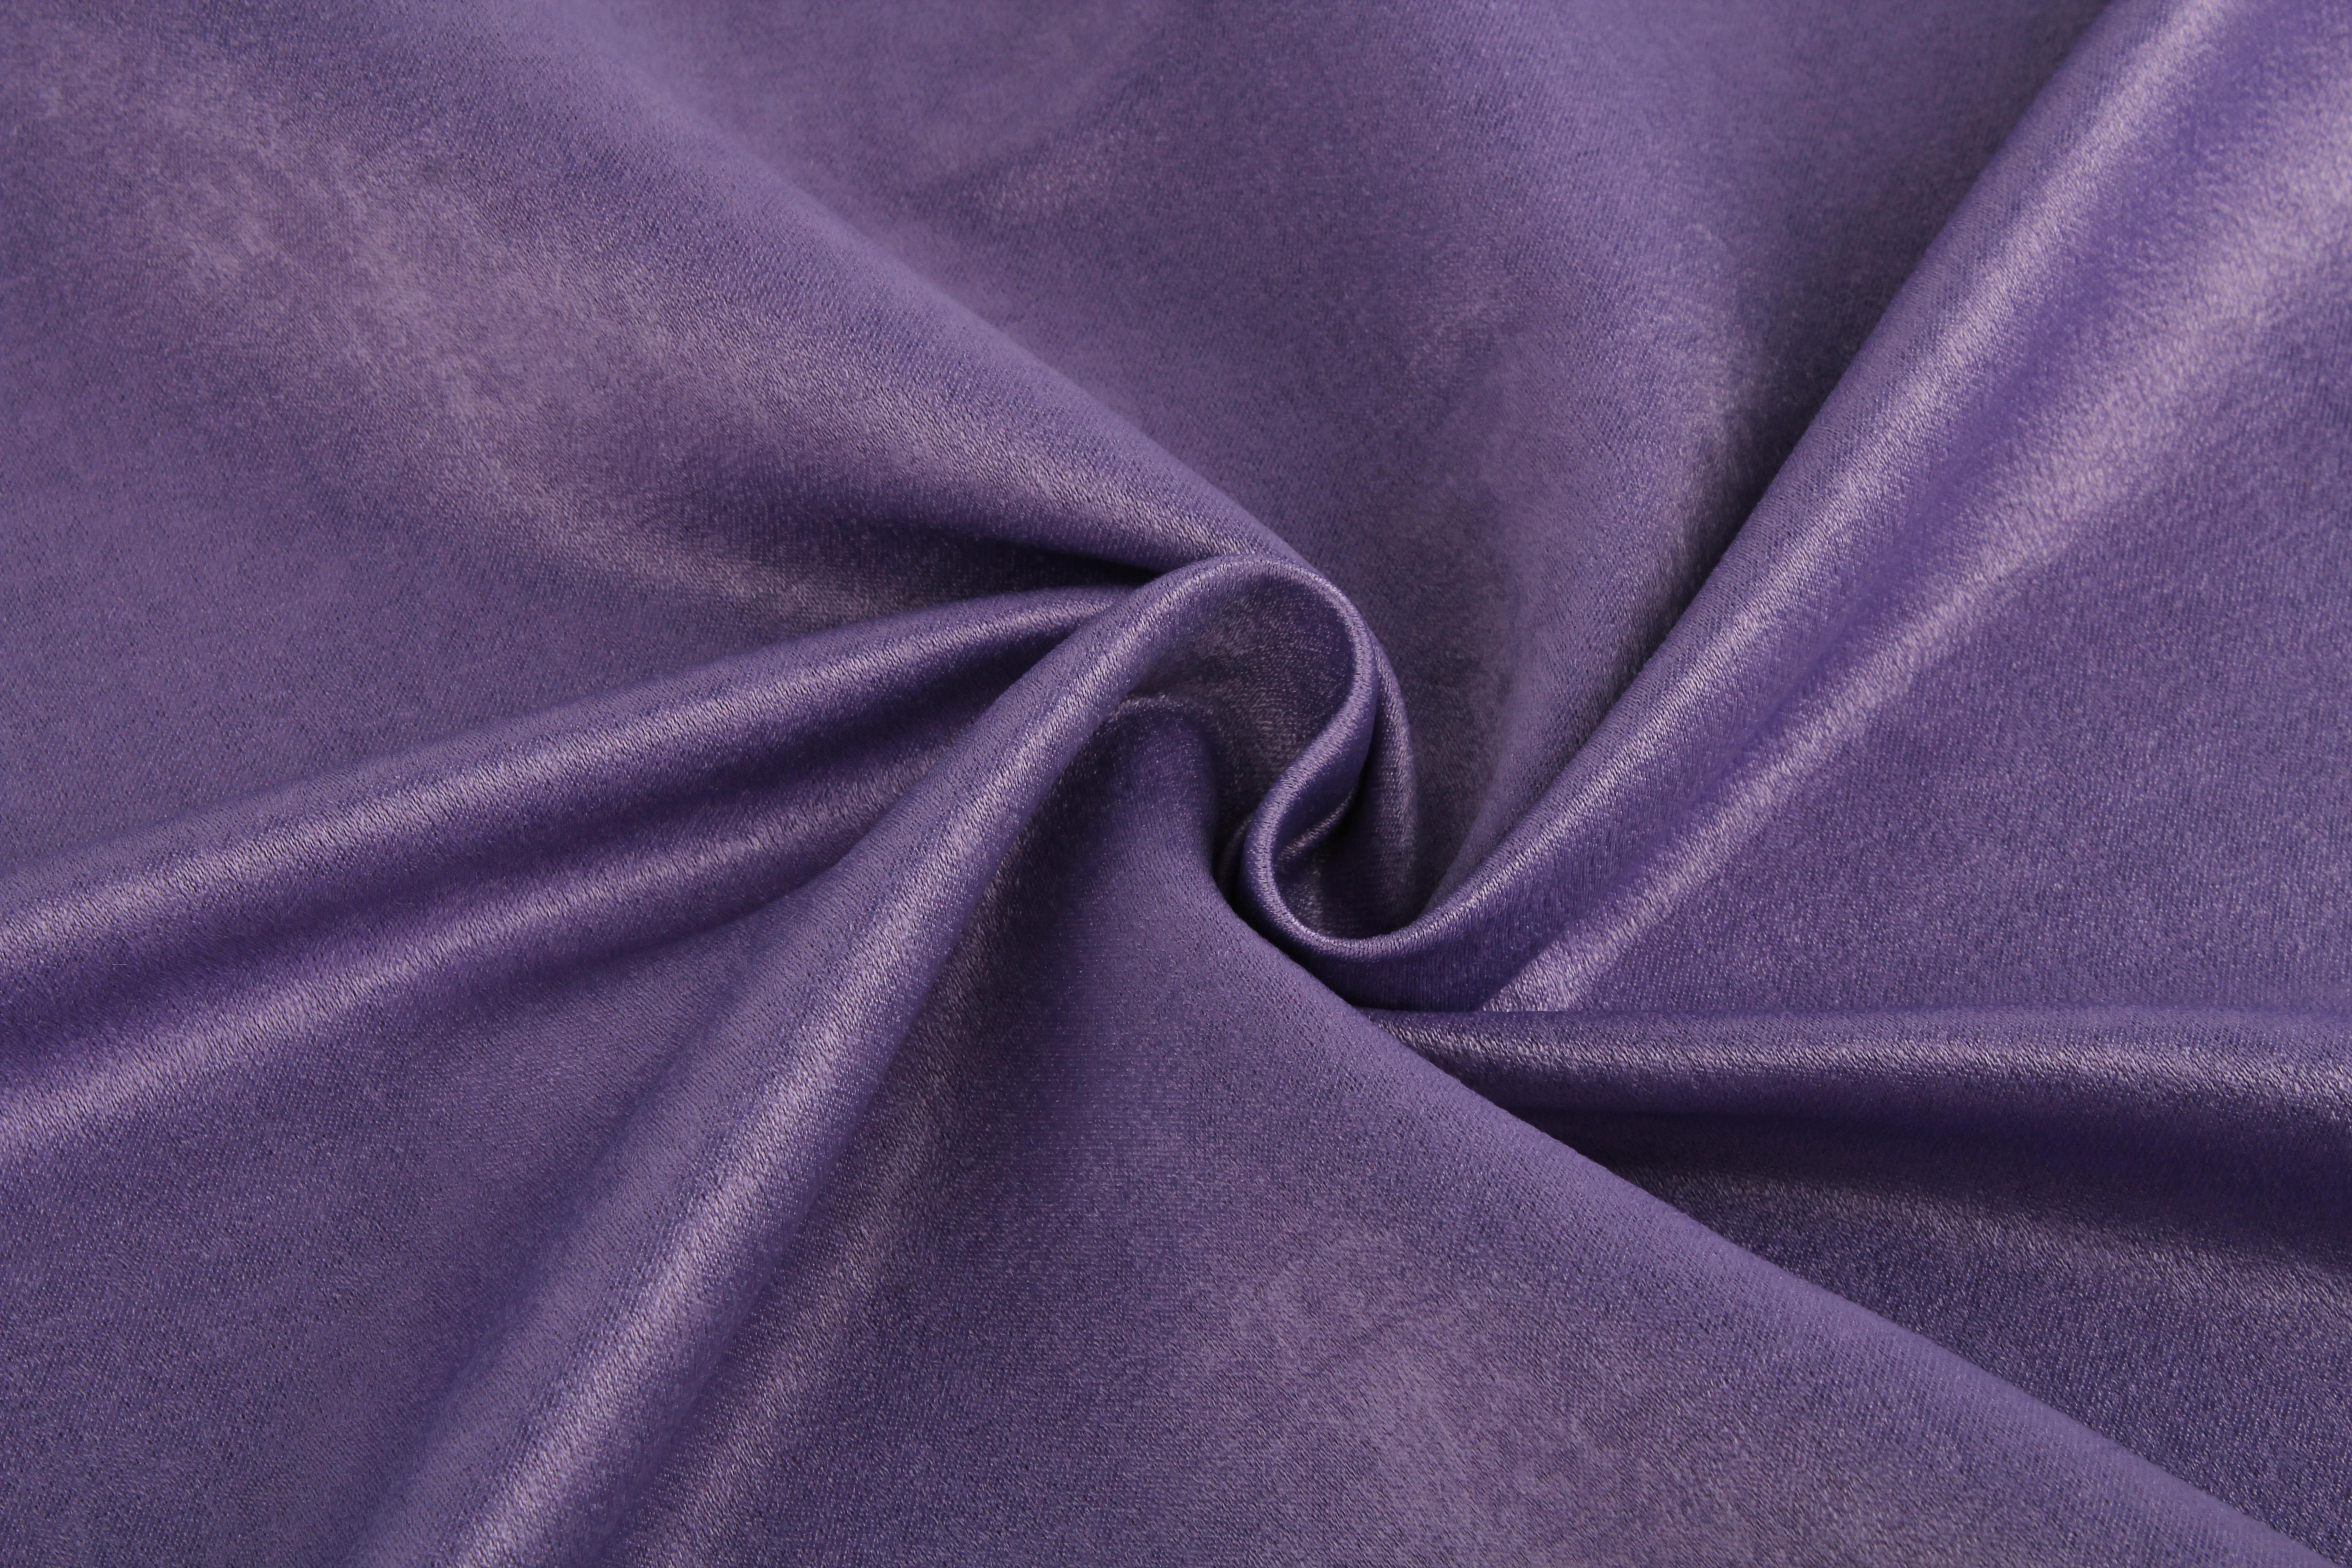 {} TexRepublic Материал Портьерная ткань Palette Цвет: Сиреневый texrepublic материал портьерная ткань palette цвет брусничный